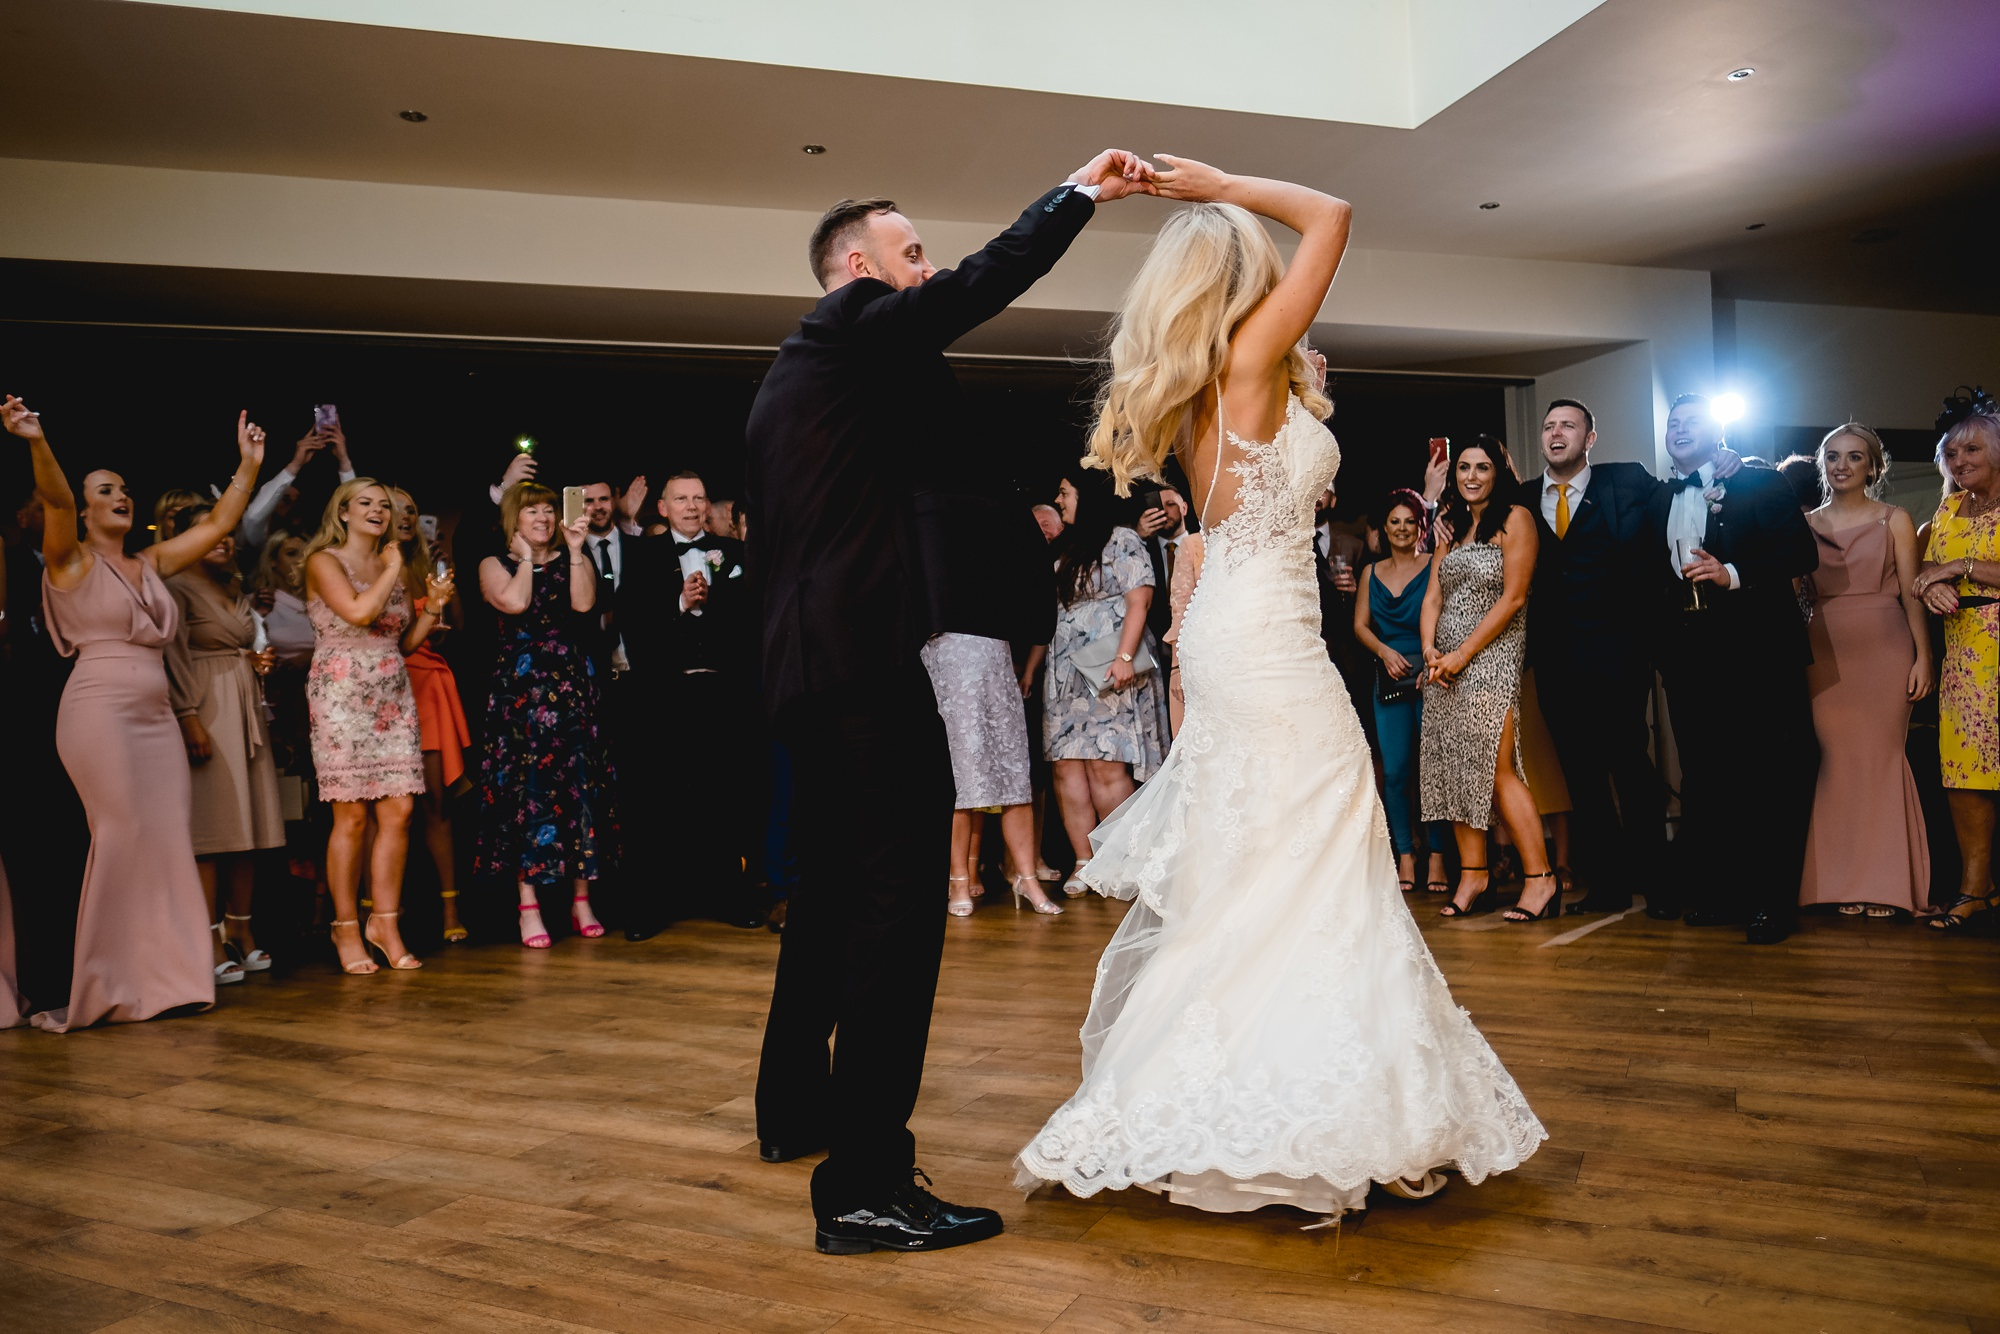 Mitton-Hall-Wedding-Photographer_0026.jpg